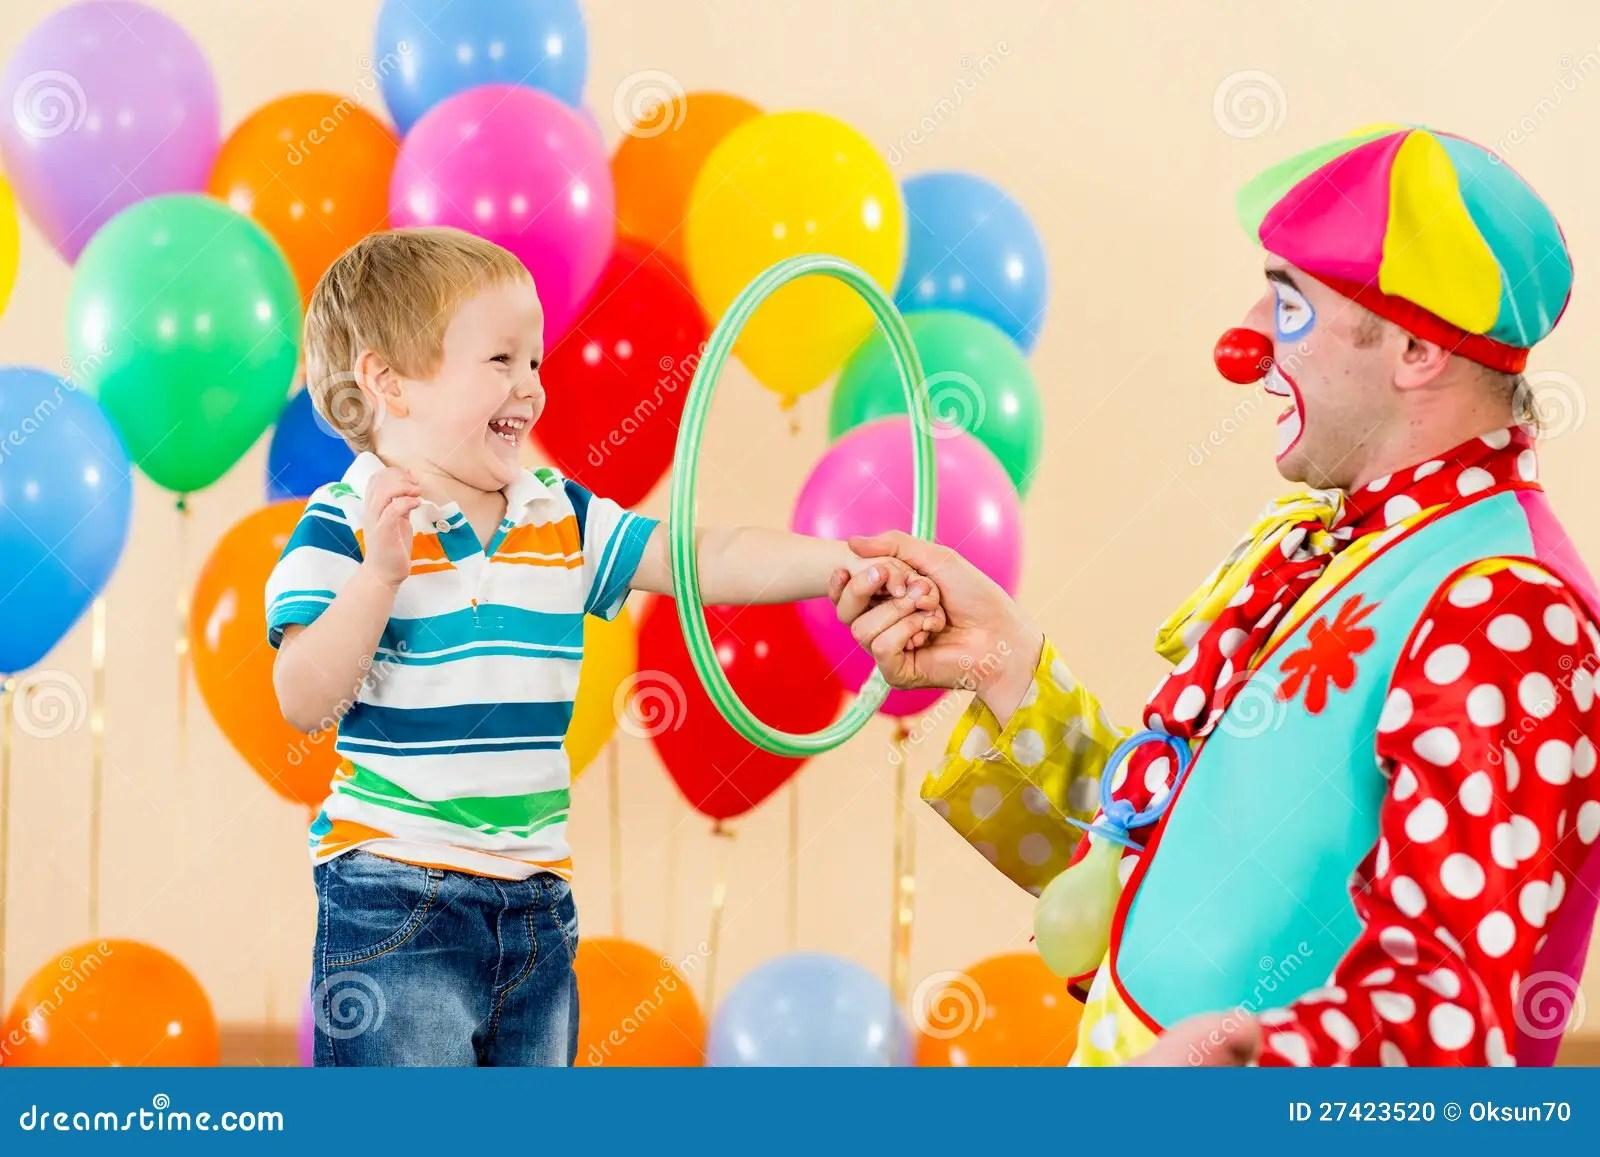 Clown Amusing Child Boy On Birthday Party Stock Photo